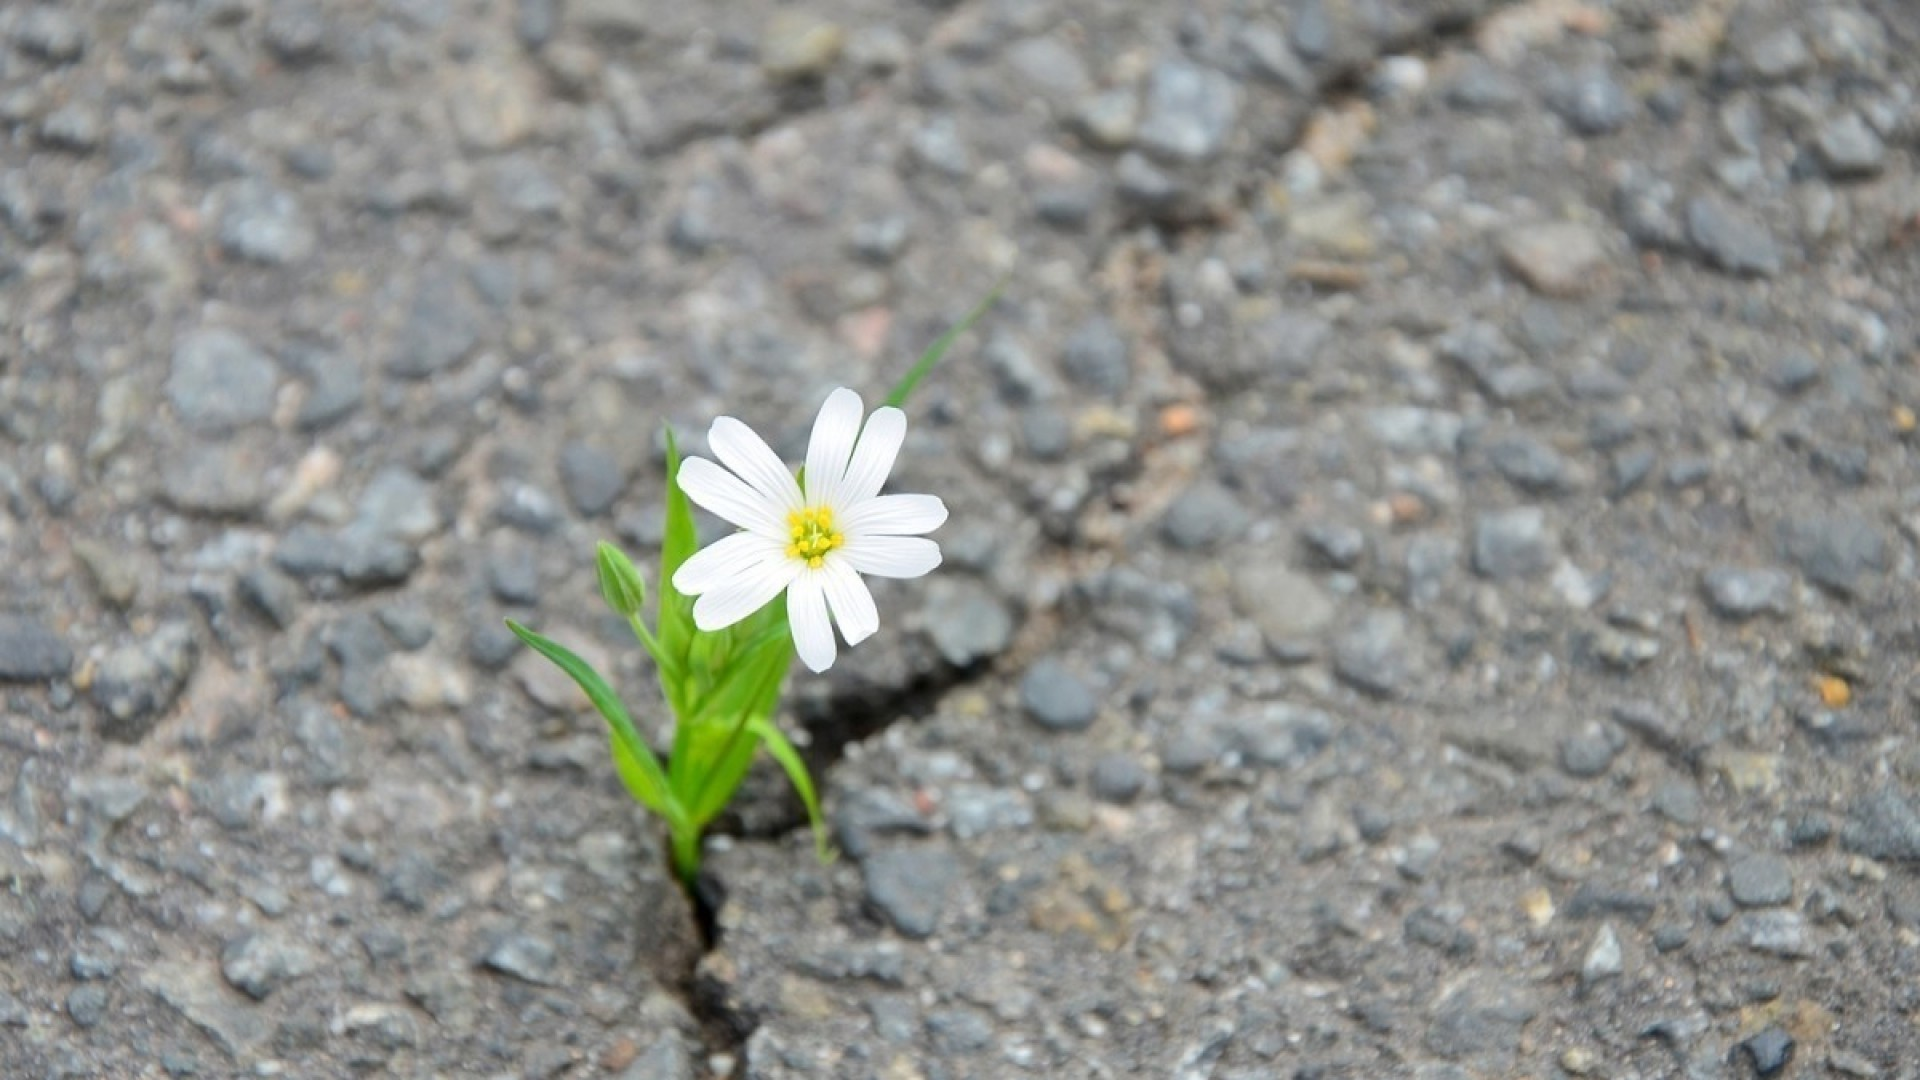 Стихи о том, как мы преодолеваем трудности